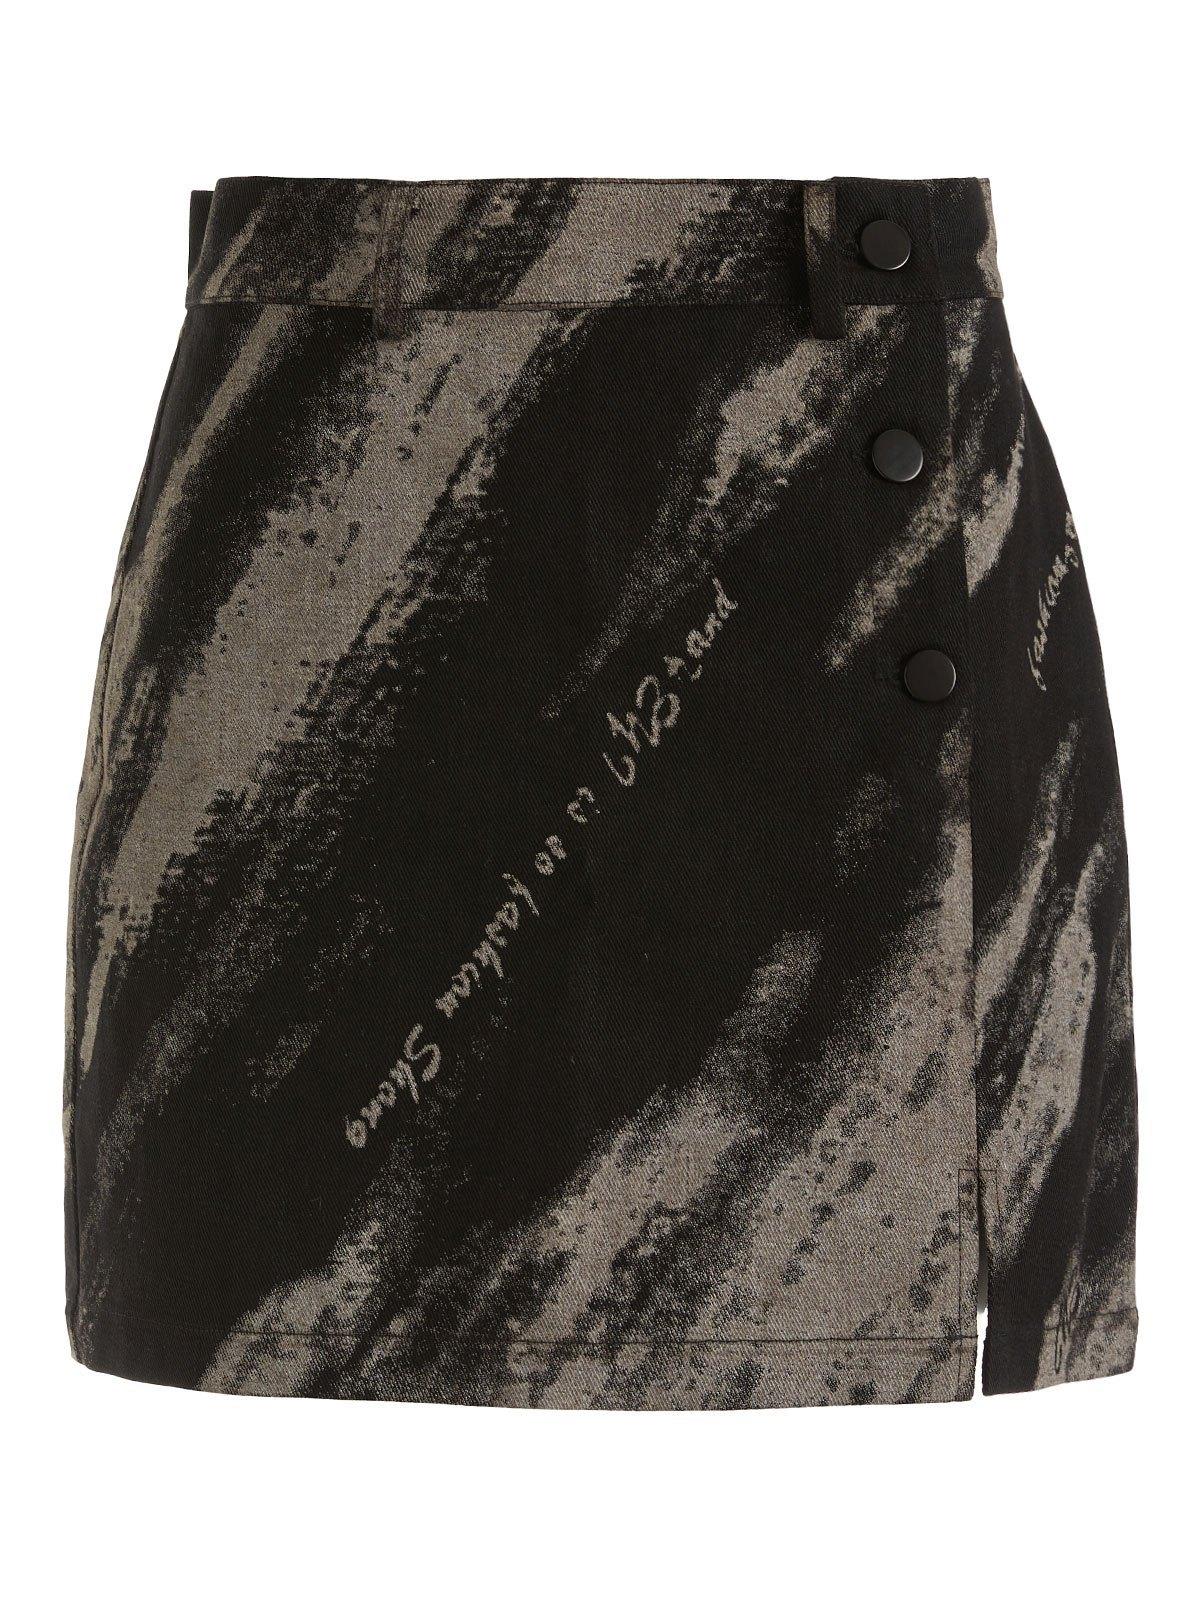 EMMIOL Tie Dye Buttoned Mini Skirt - Black S